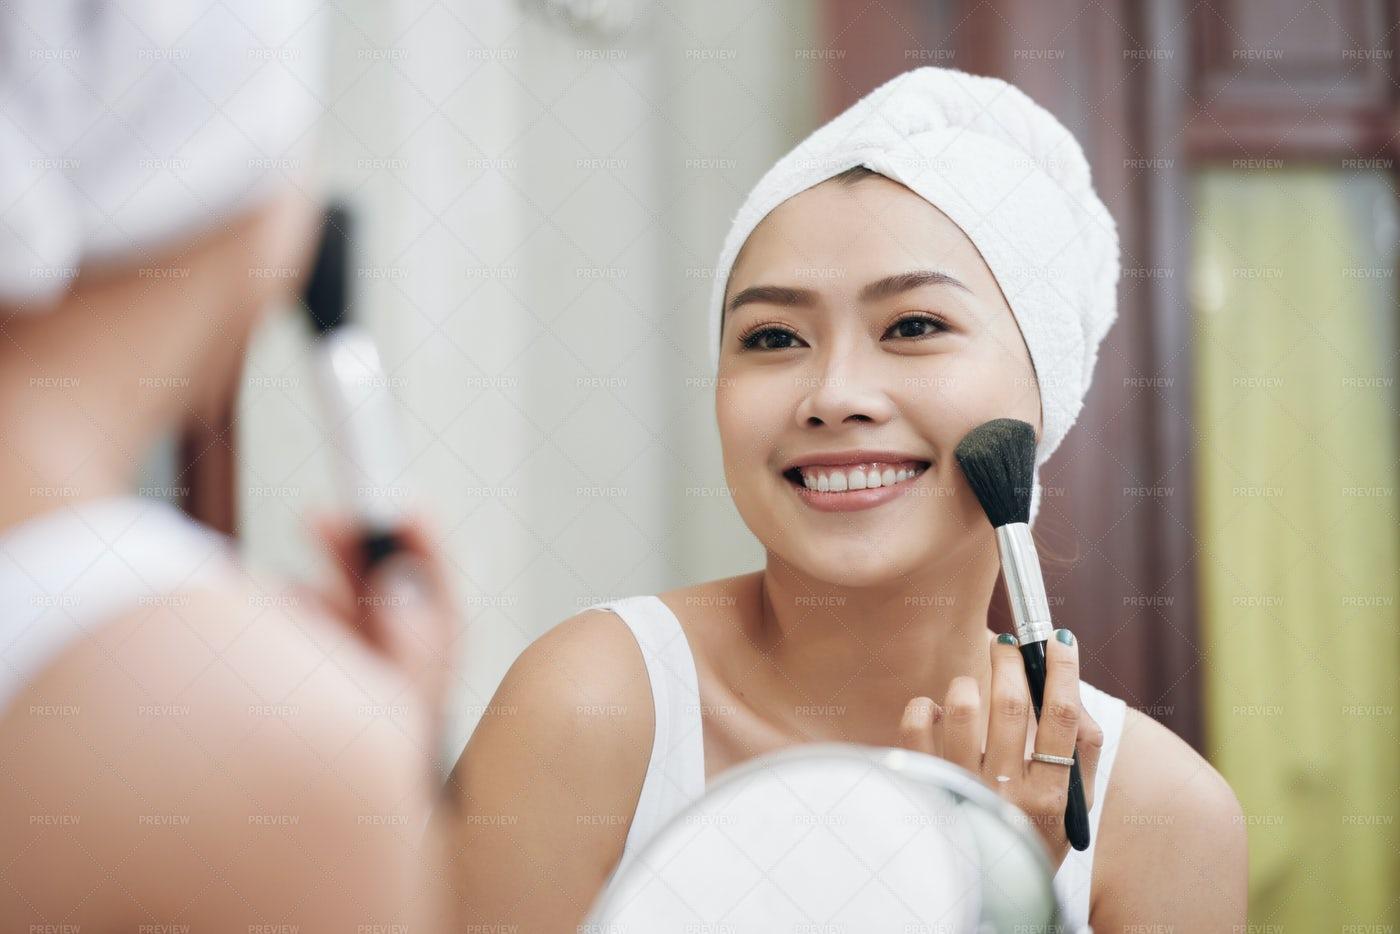 Smiling Woman Applying Makeup In...: Stock Photos